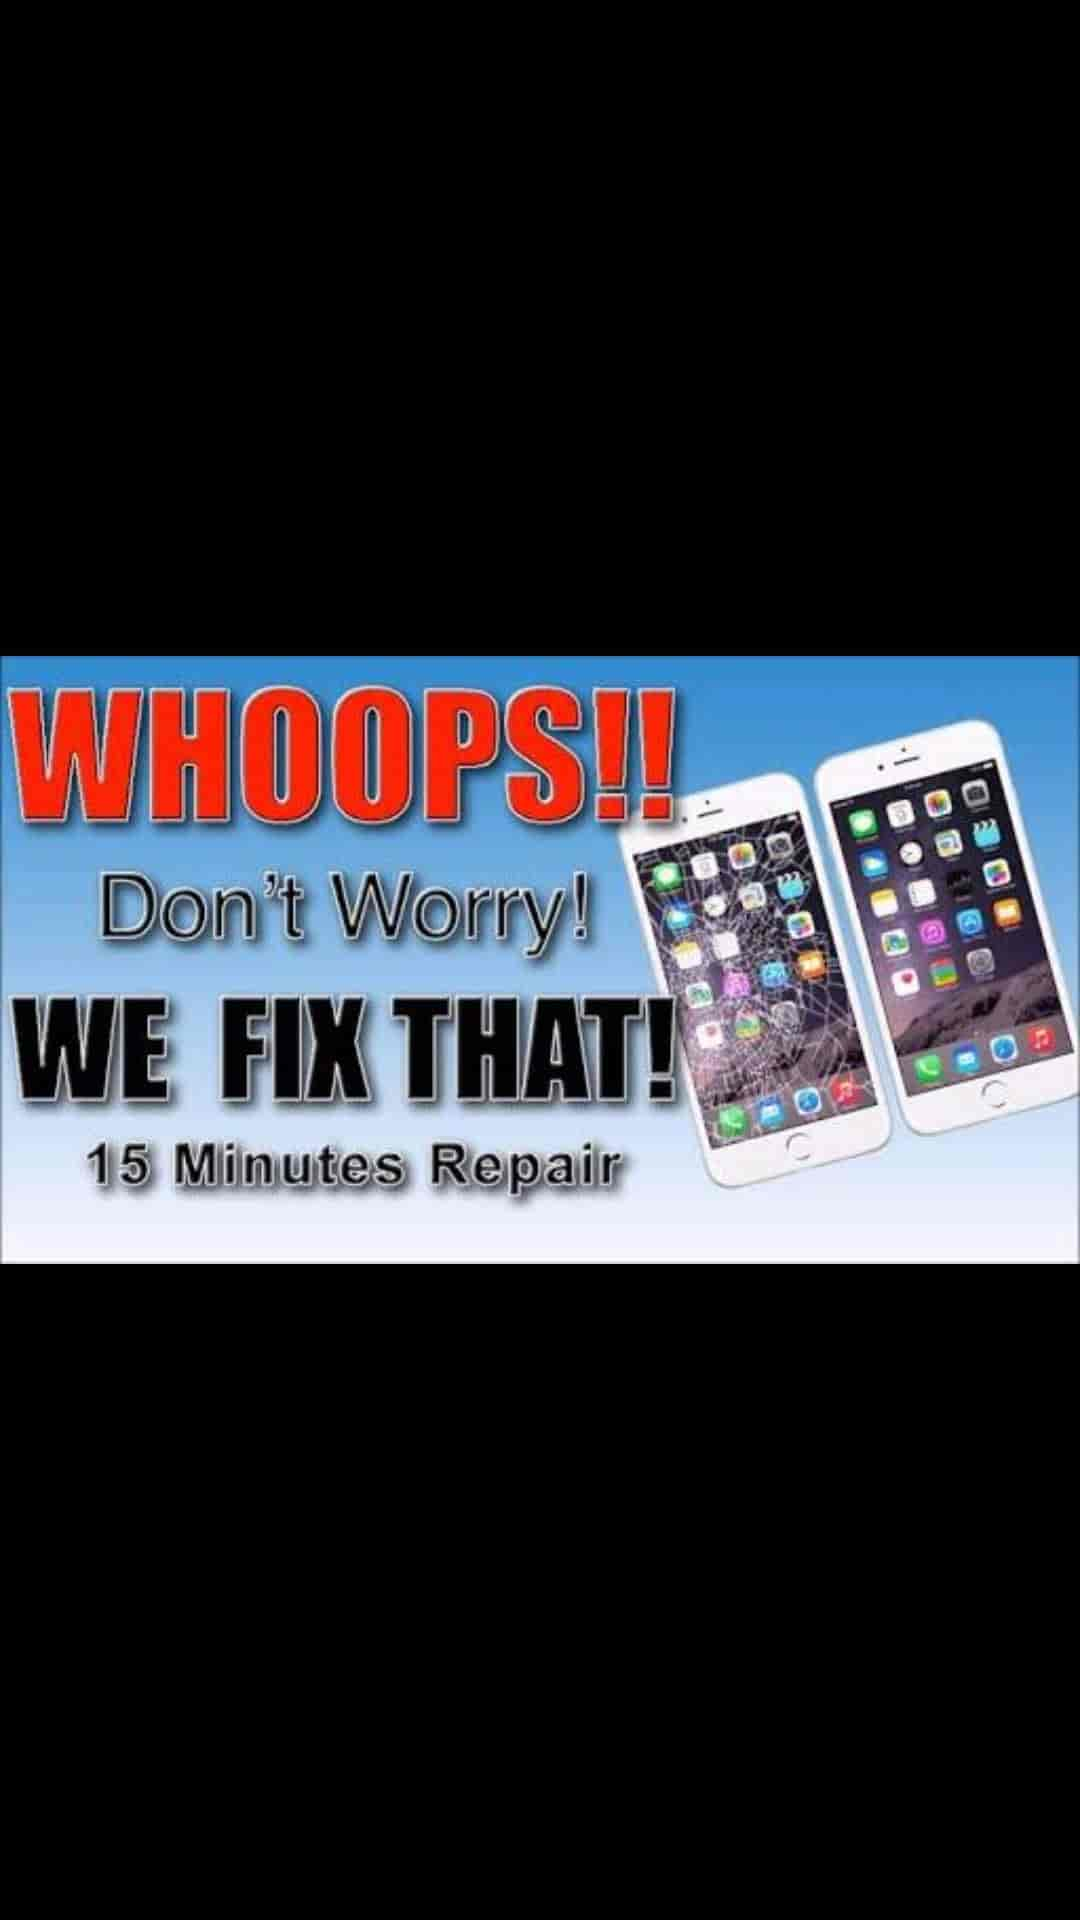 Fix My Phone >> Fix My Phone Saket Mobile Phone Repair Services In Delhi Justdial